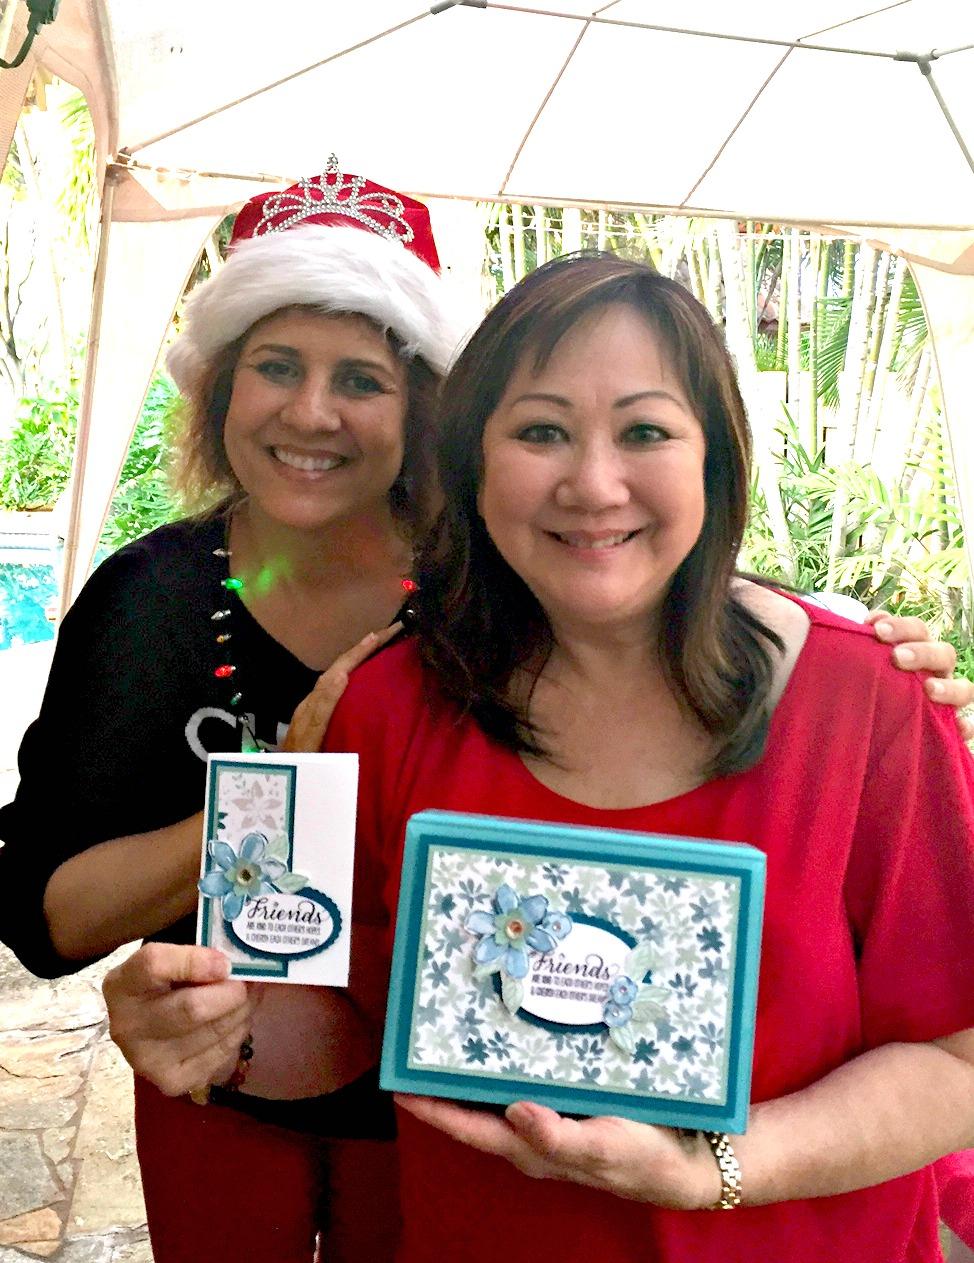 SWA Holiday Gift Exchange - www.stampedwithaloha.com